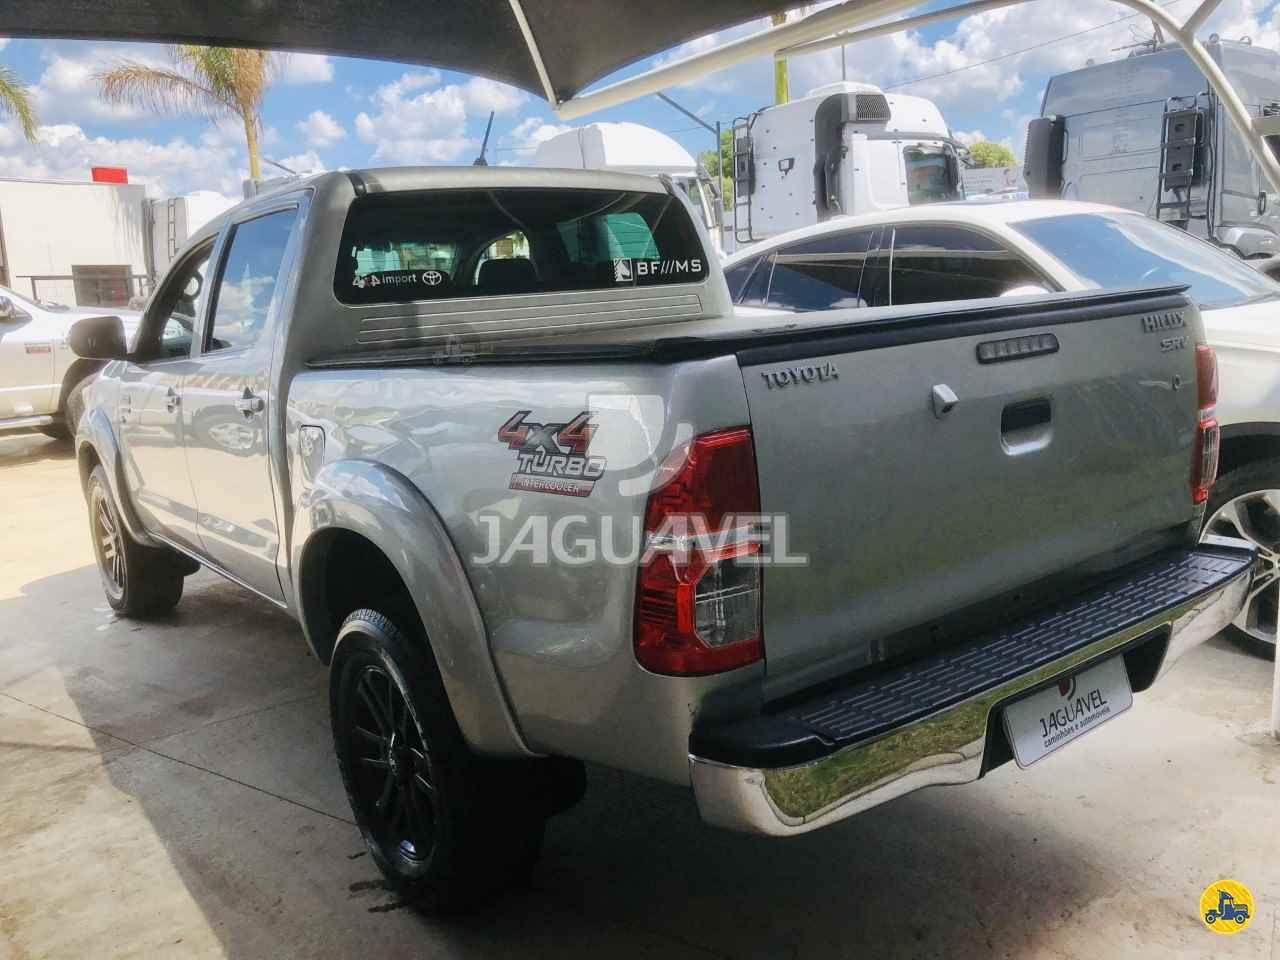 TOYOTA Hilux 2.7 SRV 100000km 2012/2012 Jaguavel Caminhões